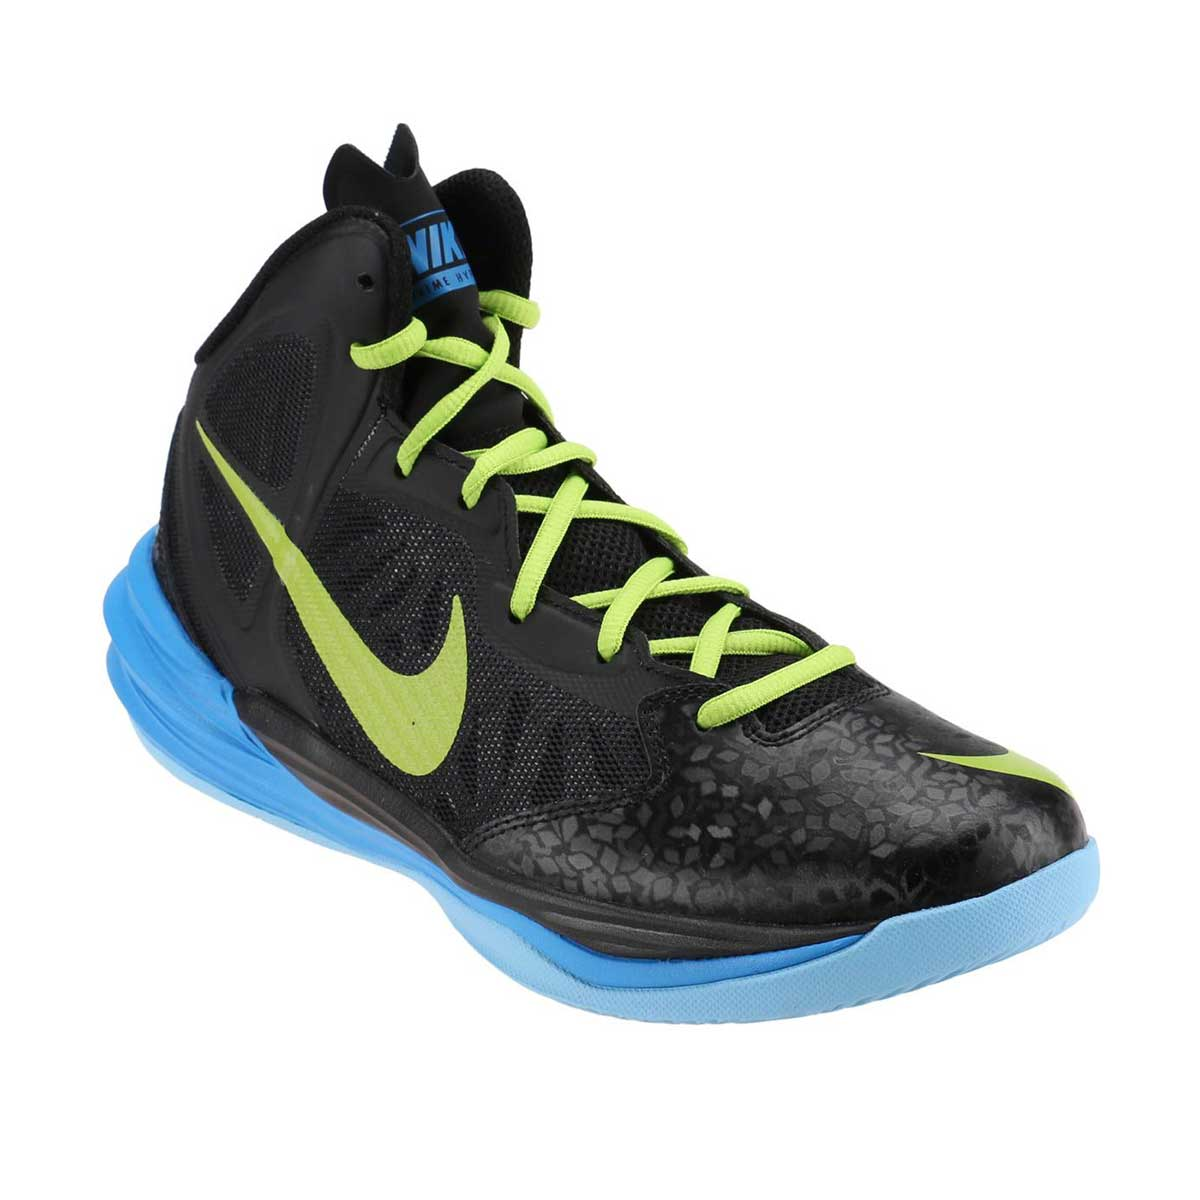 Acheter Nike Chaussures De Basket-ball En Ligne Inde